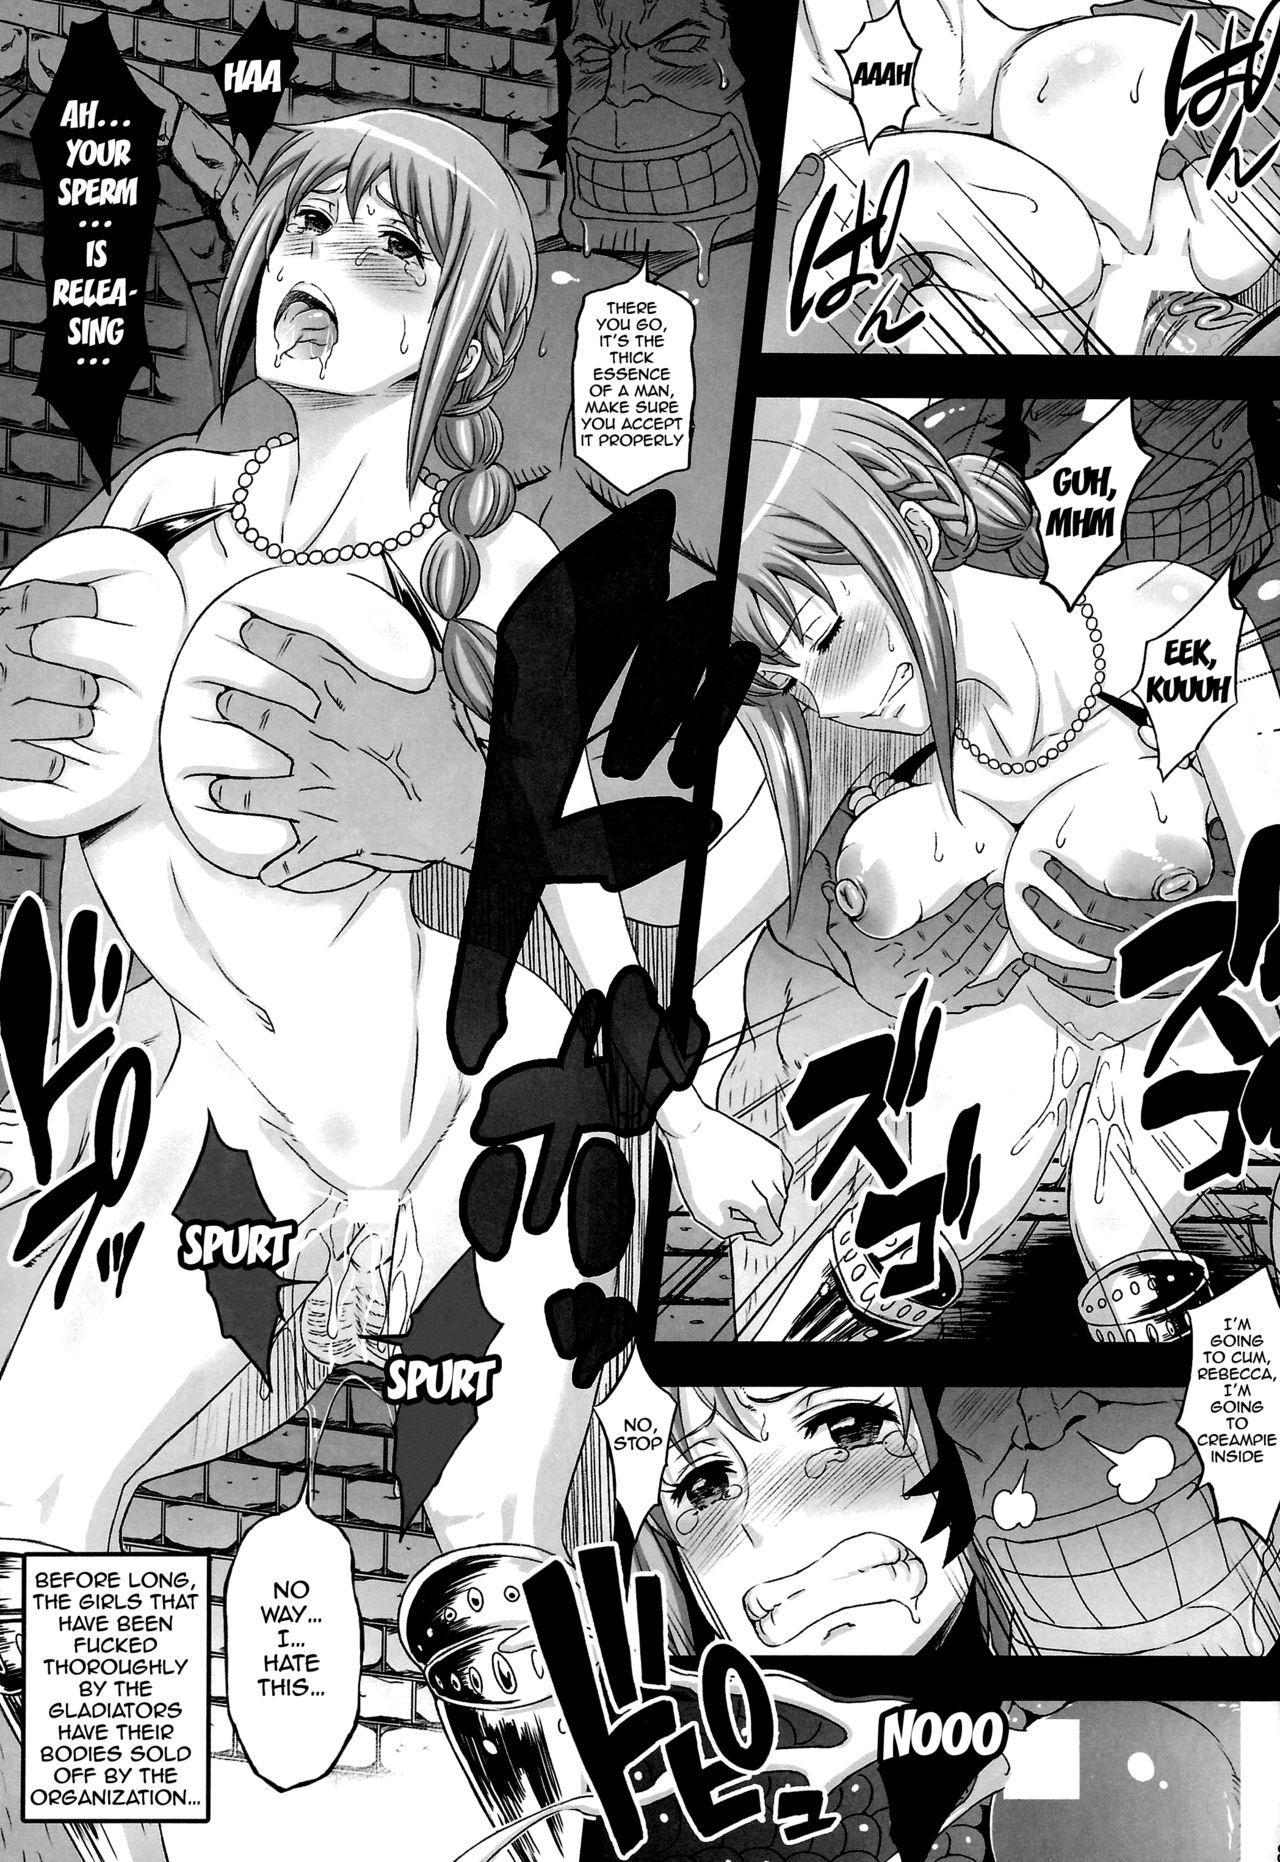 (C87) [Diogenes Club (Haikawa Hemlen)] Rakuen Onna Kaizoku Soushuuhen ~GOLD~ - Woman Pirate in Paradise (One Piece) [English] {doujin-moe.us} [Incomplete] 4